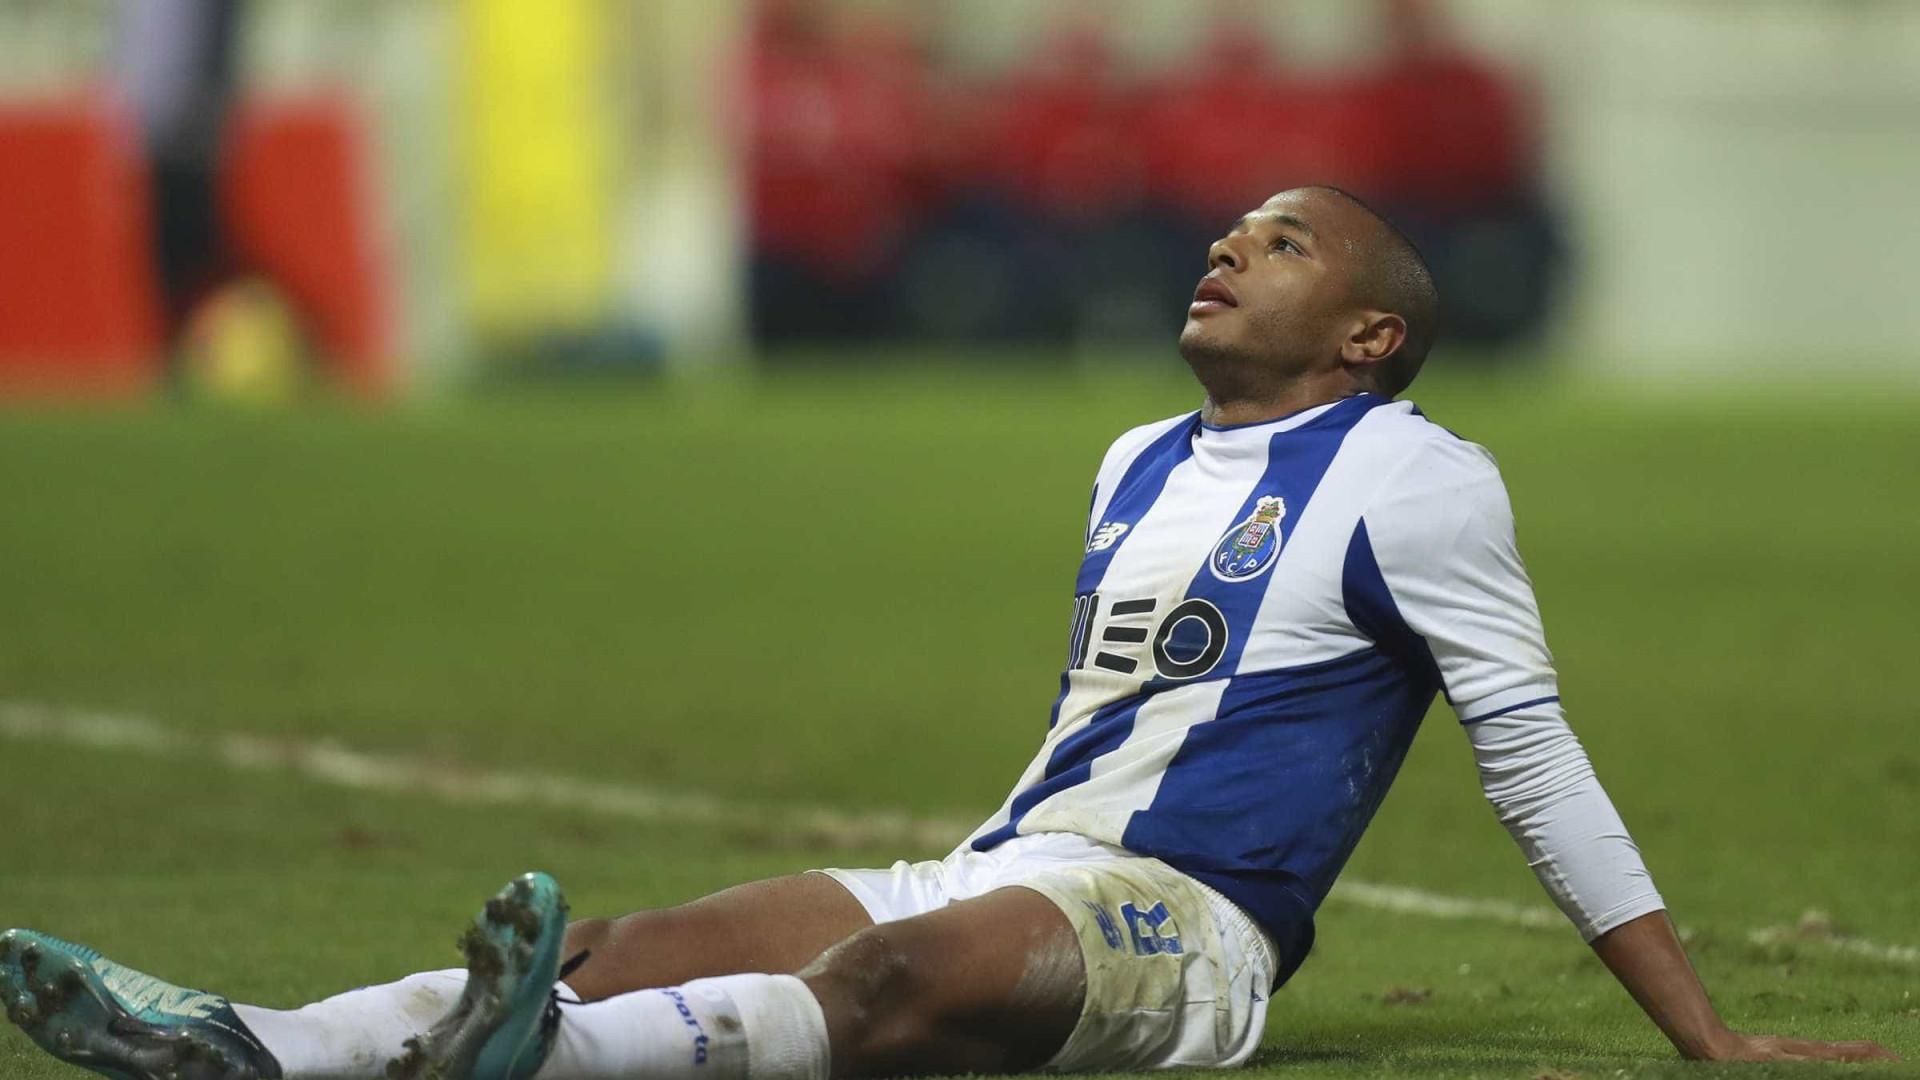 Guarda-redes do Moreirense pensava que tinha perdido o jogo | VÍDEO